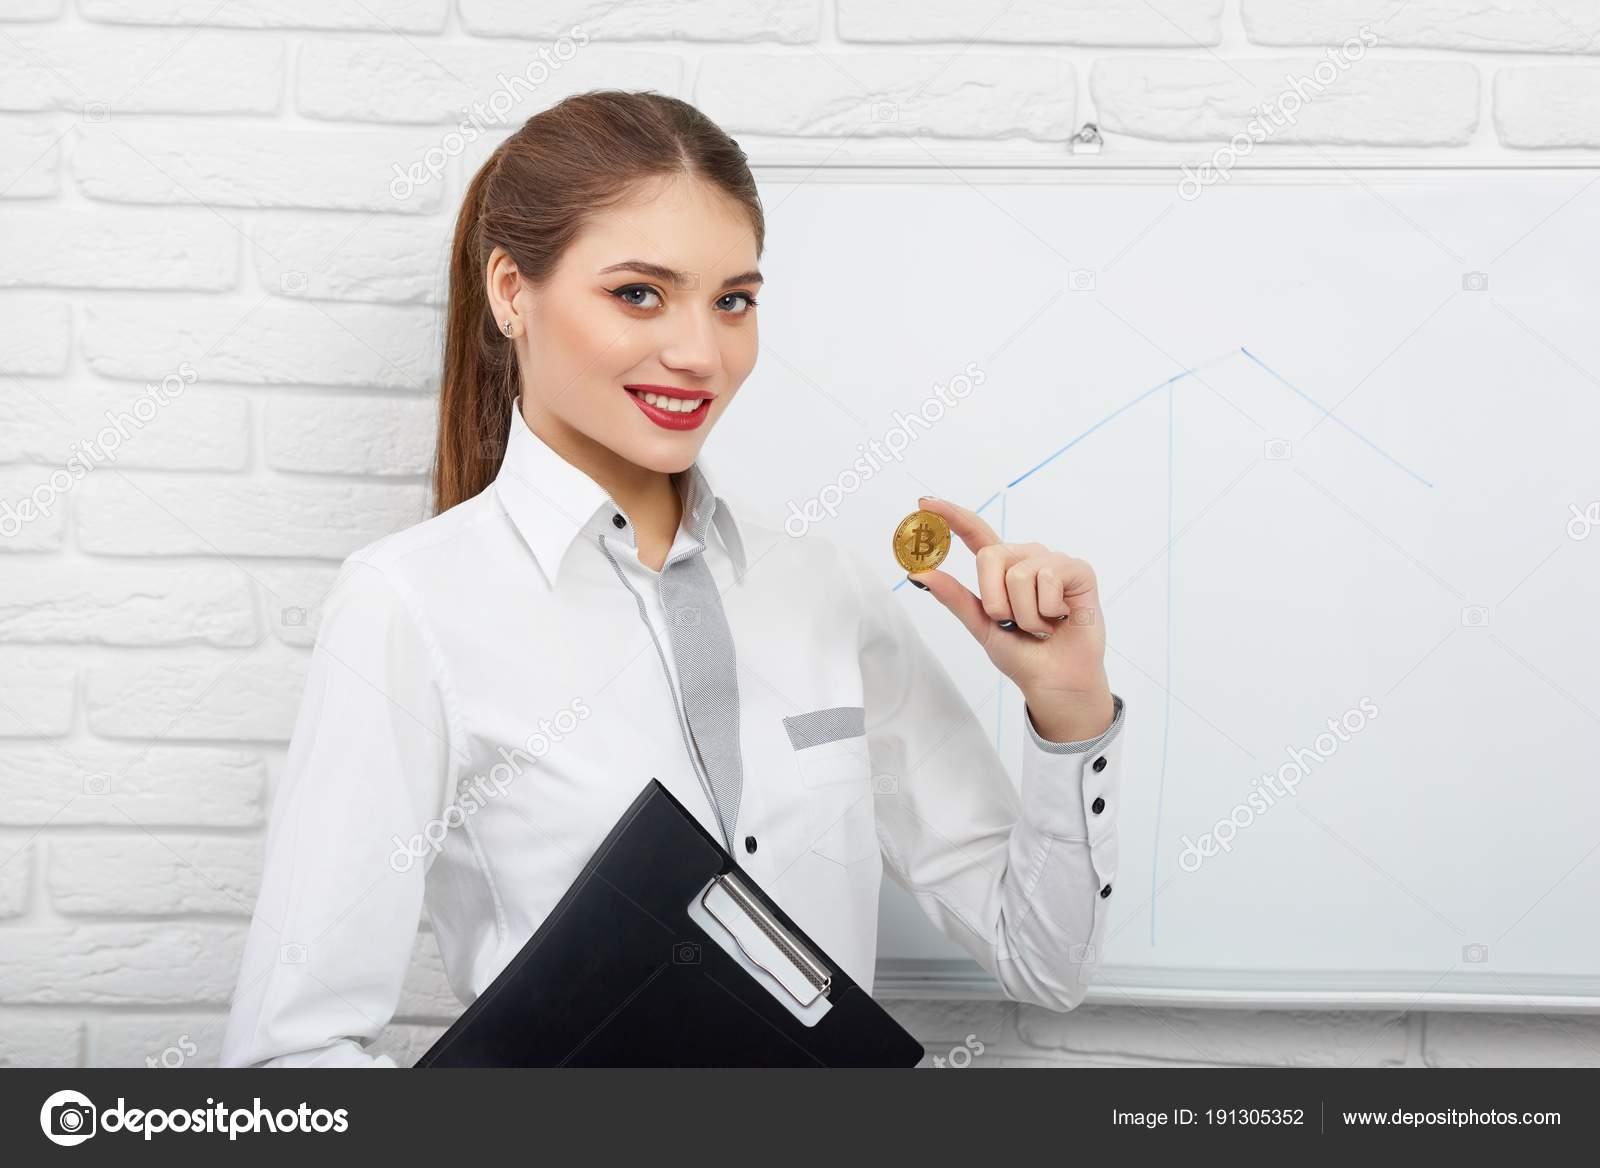 696a9331de02 Ελκυστική χαμογελαστή γυναίκα σε λευκή μπλούζα έξυπνη εκμετάλλευση  κρυπτονόμισμα bitcoin και μαύρο φάκελο κοντά Διοικητικό Συμβούλιο λευκό  παρουσίαση ...